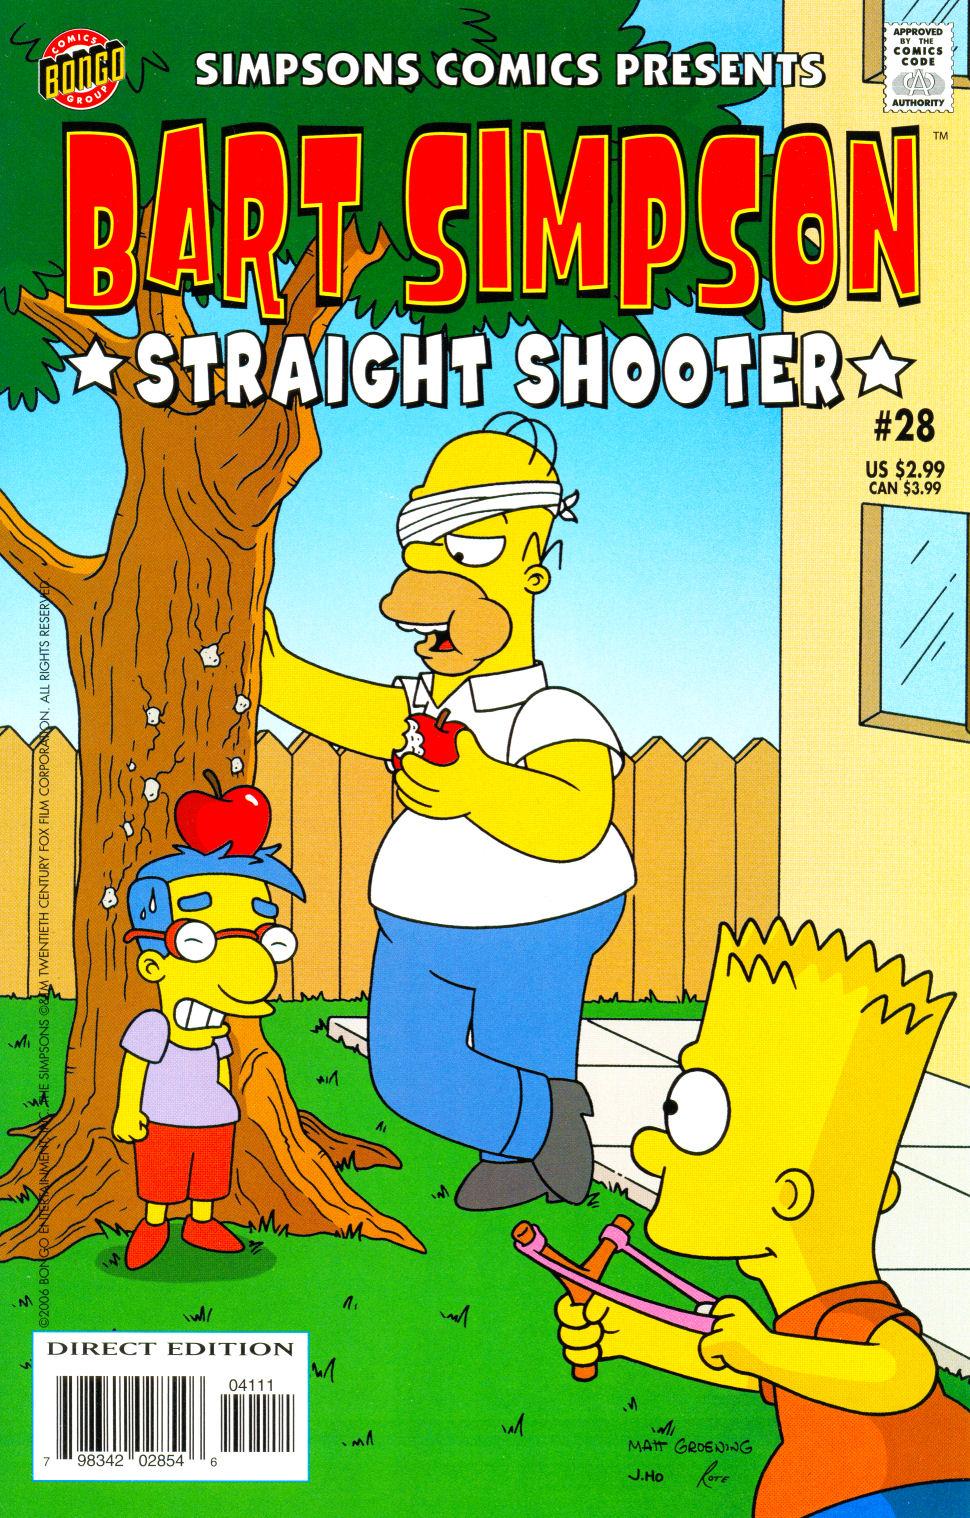 Read online Simpsons Comics Presents Bart Simpson comic -  Issue #28 - 1